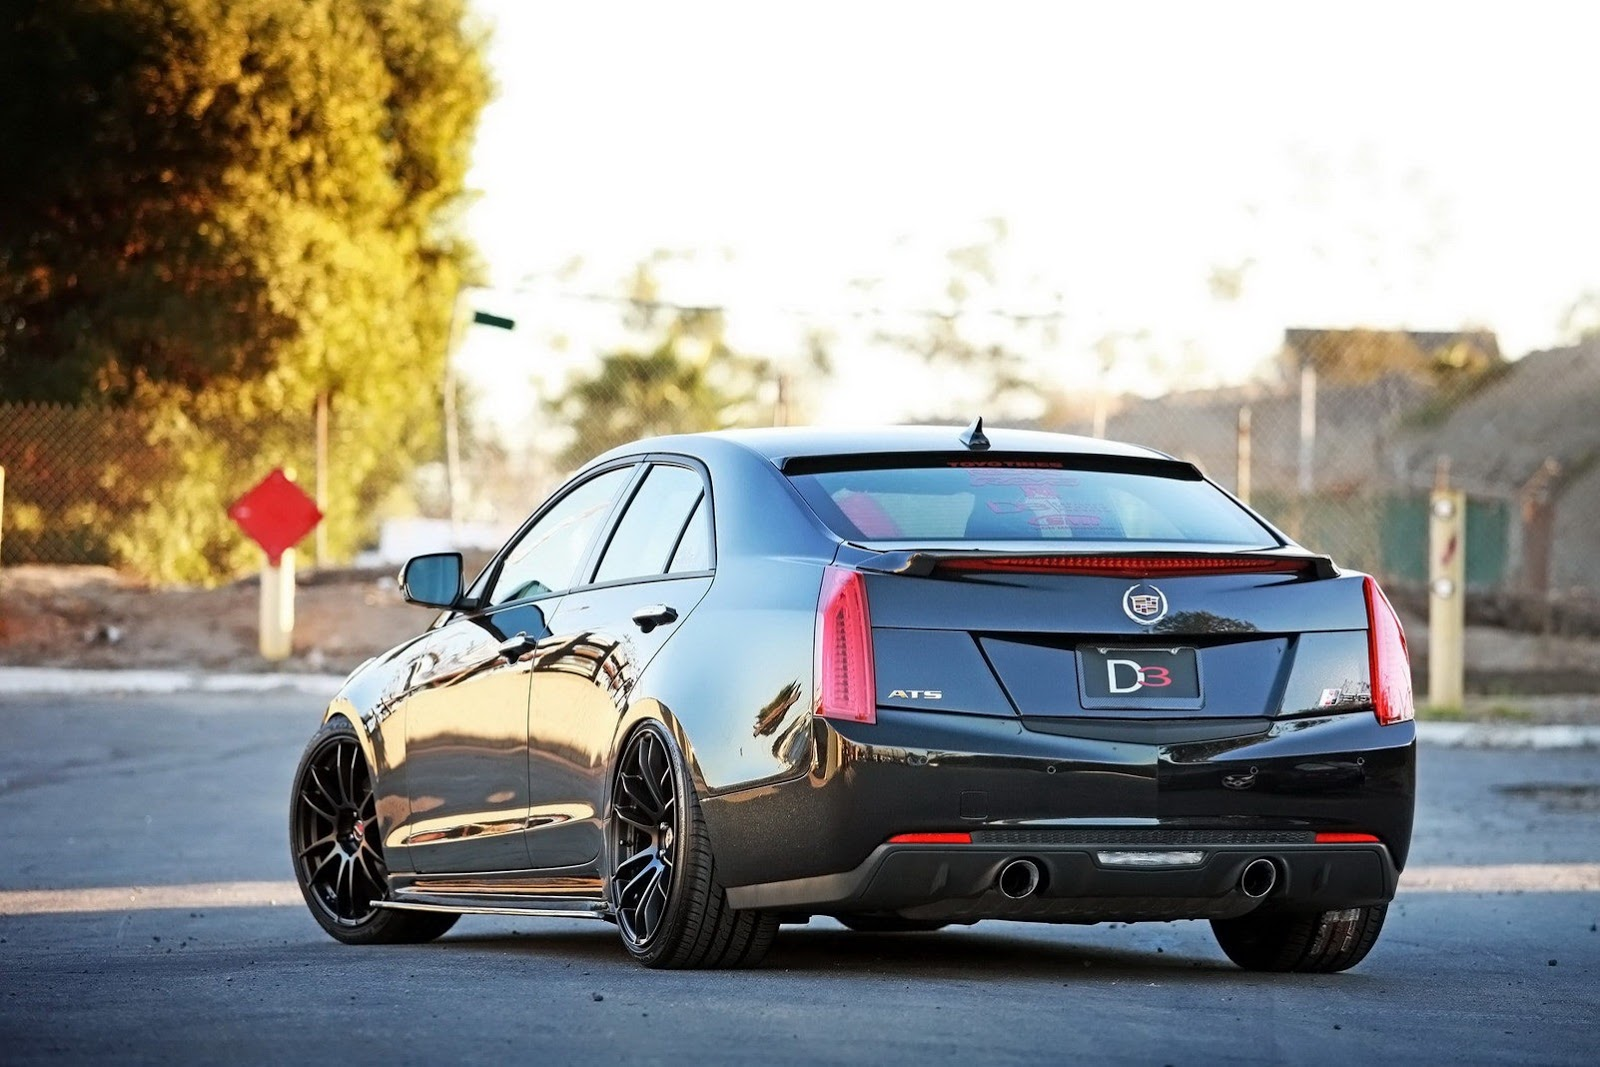 2013 Cadillac ATS Tuned by D3 - autoevolution